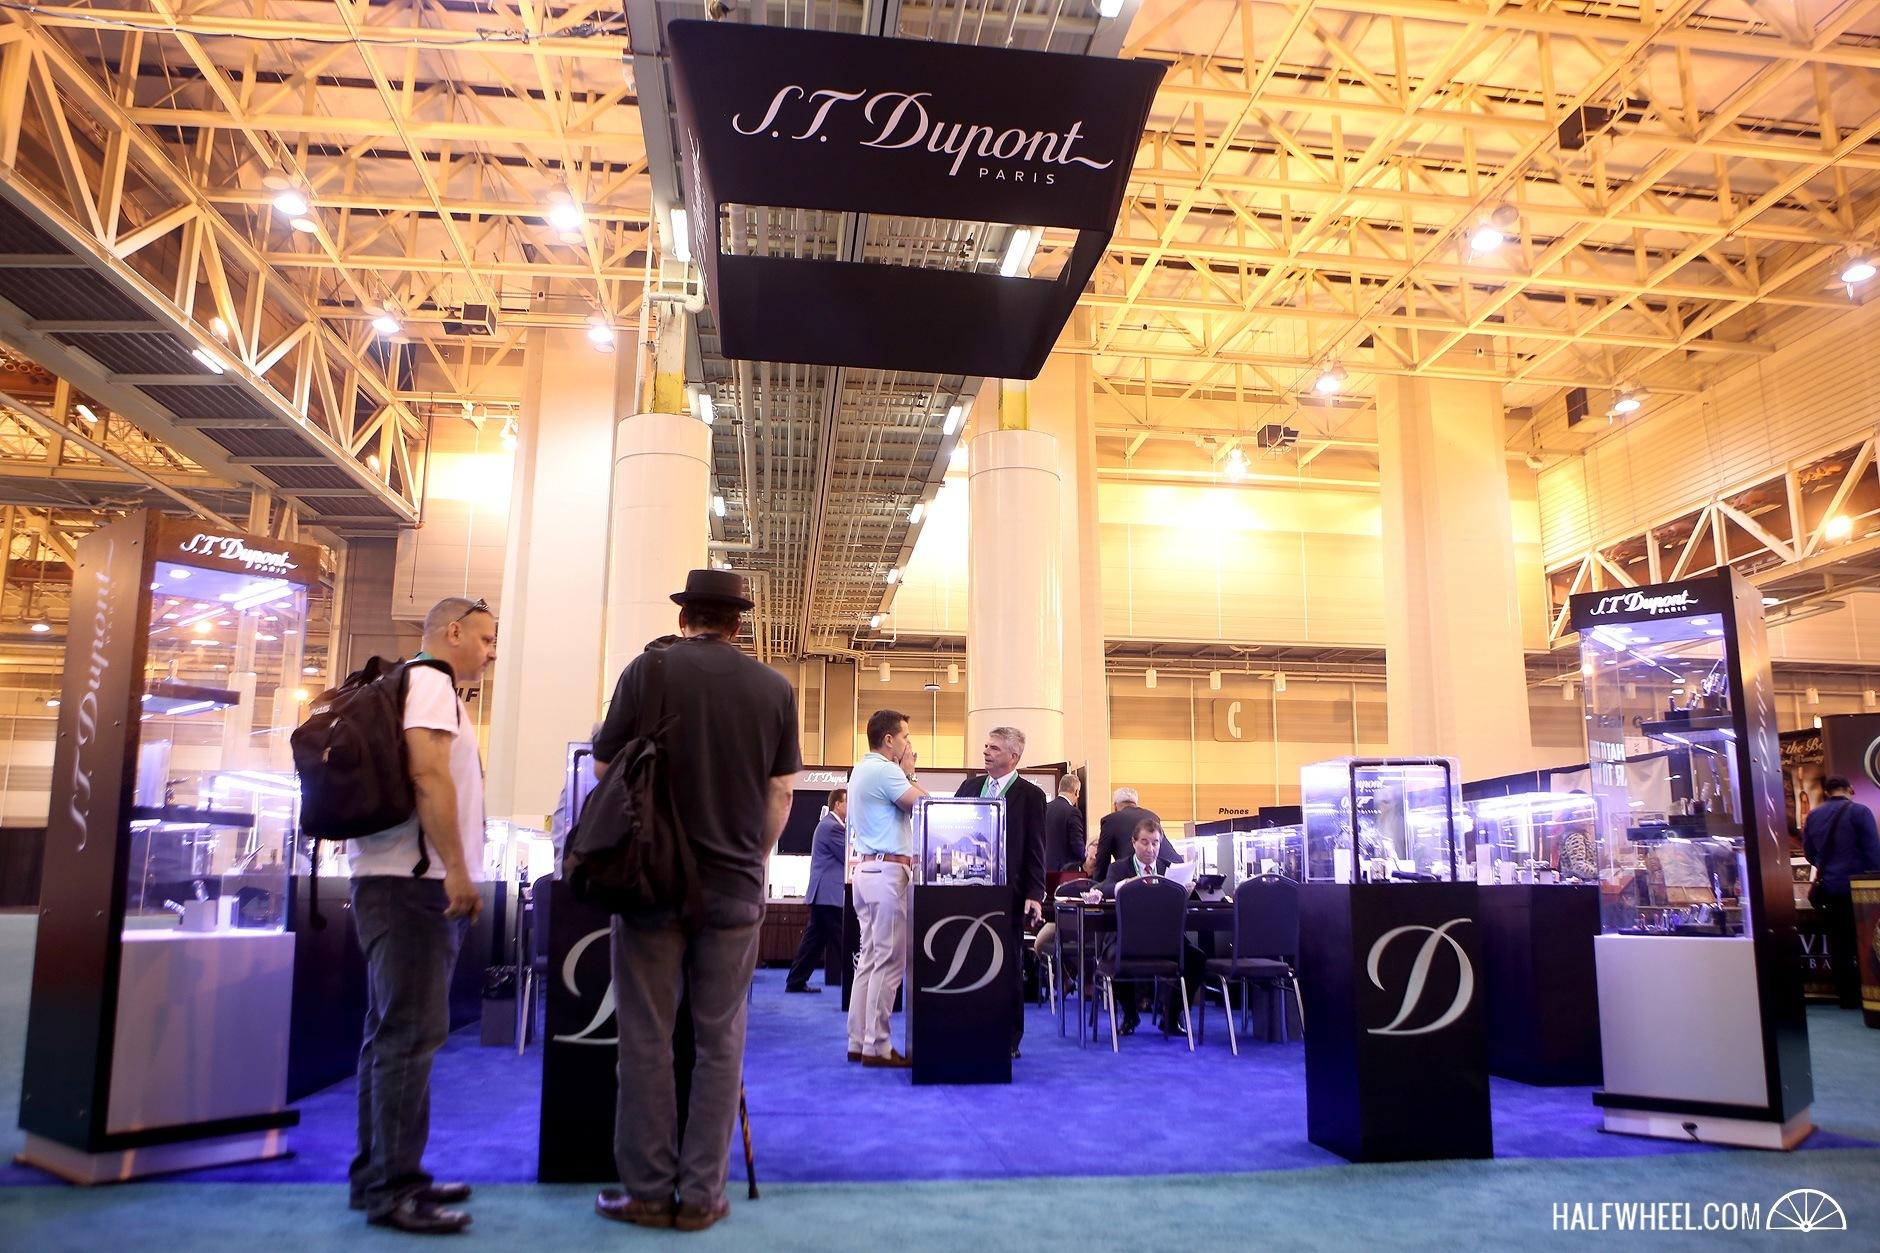 https://i2.wp.com/halfwheel.com/wp-content/uploads/2015/07/S.T.-Dupont-Booth-IPCPR-2015.jpg